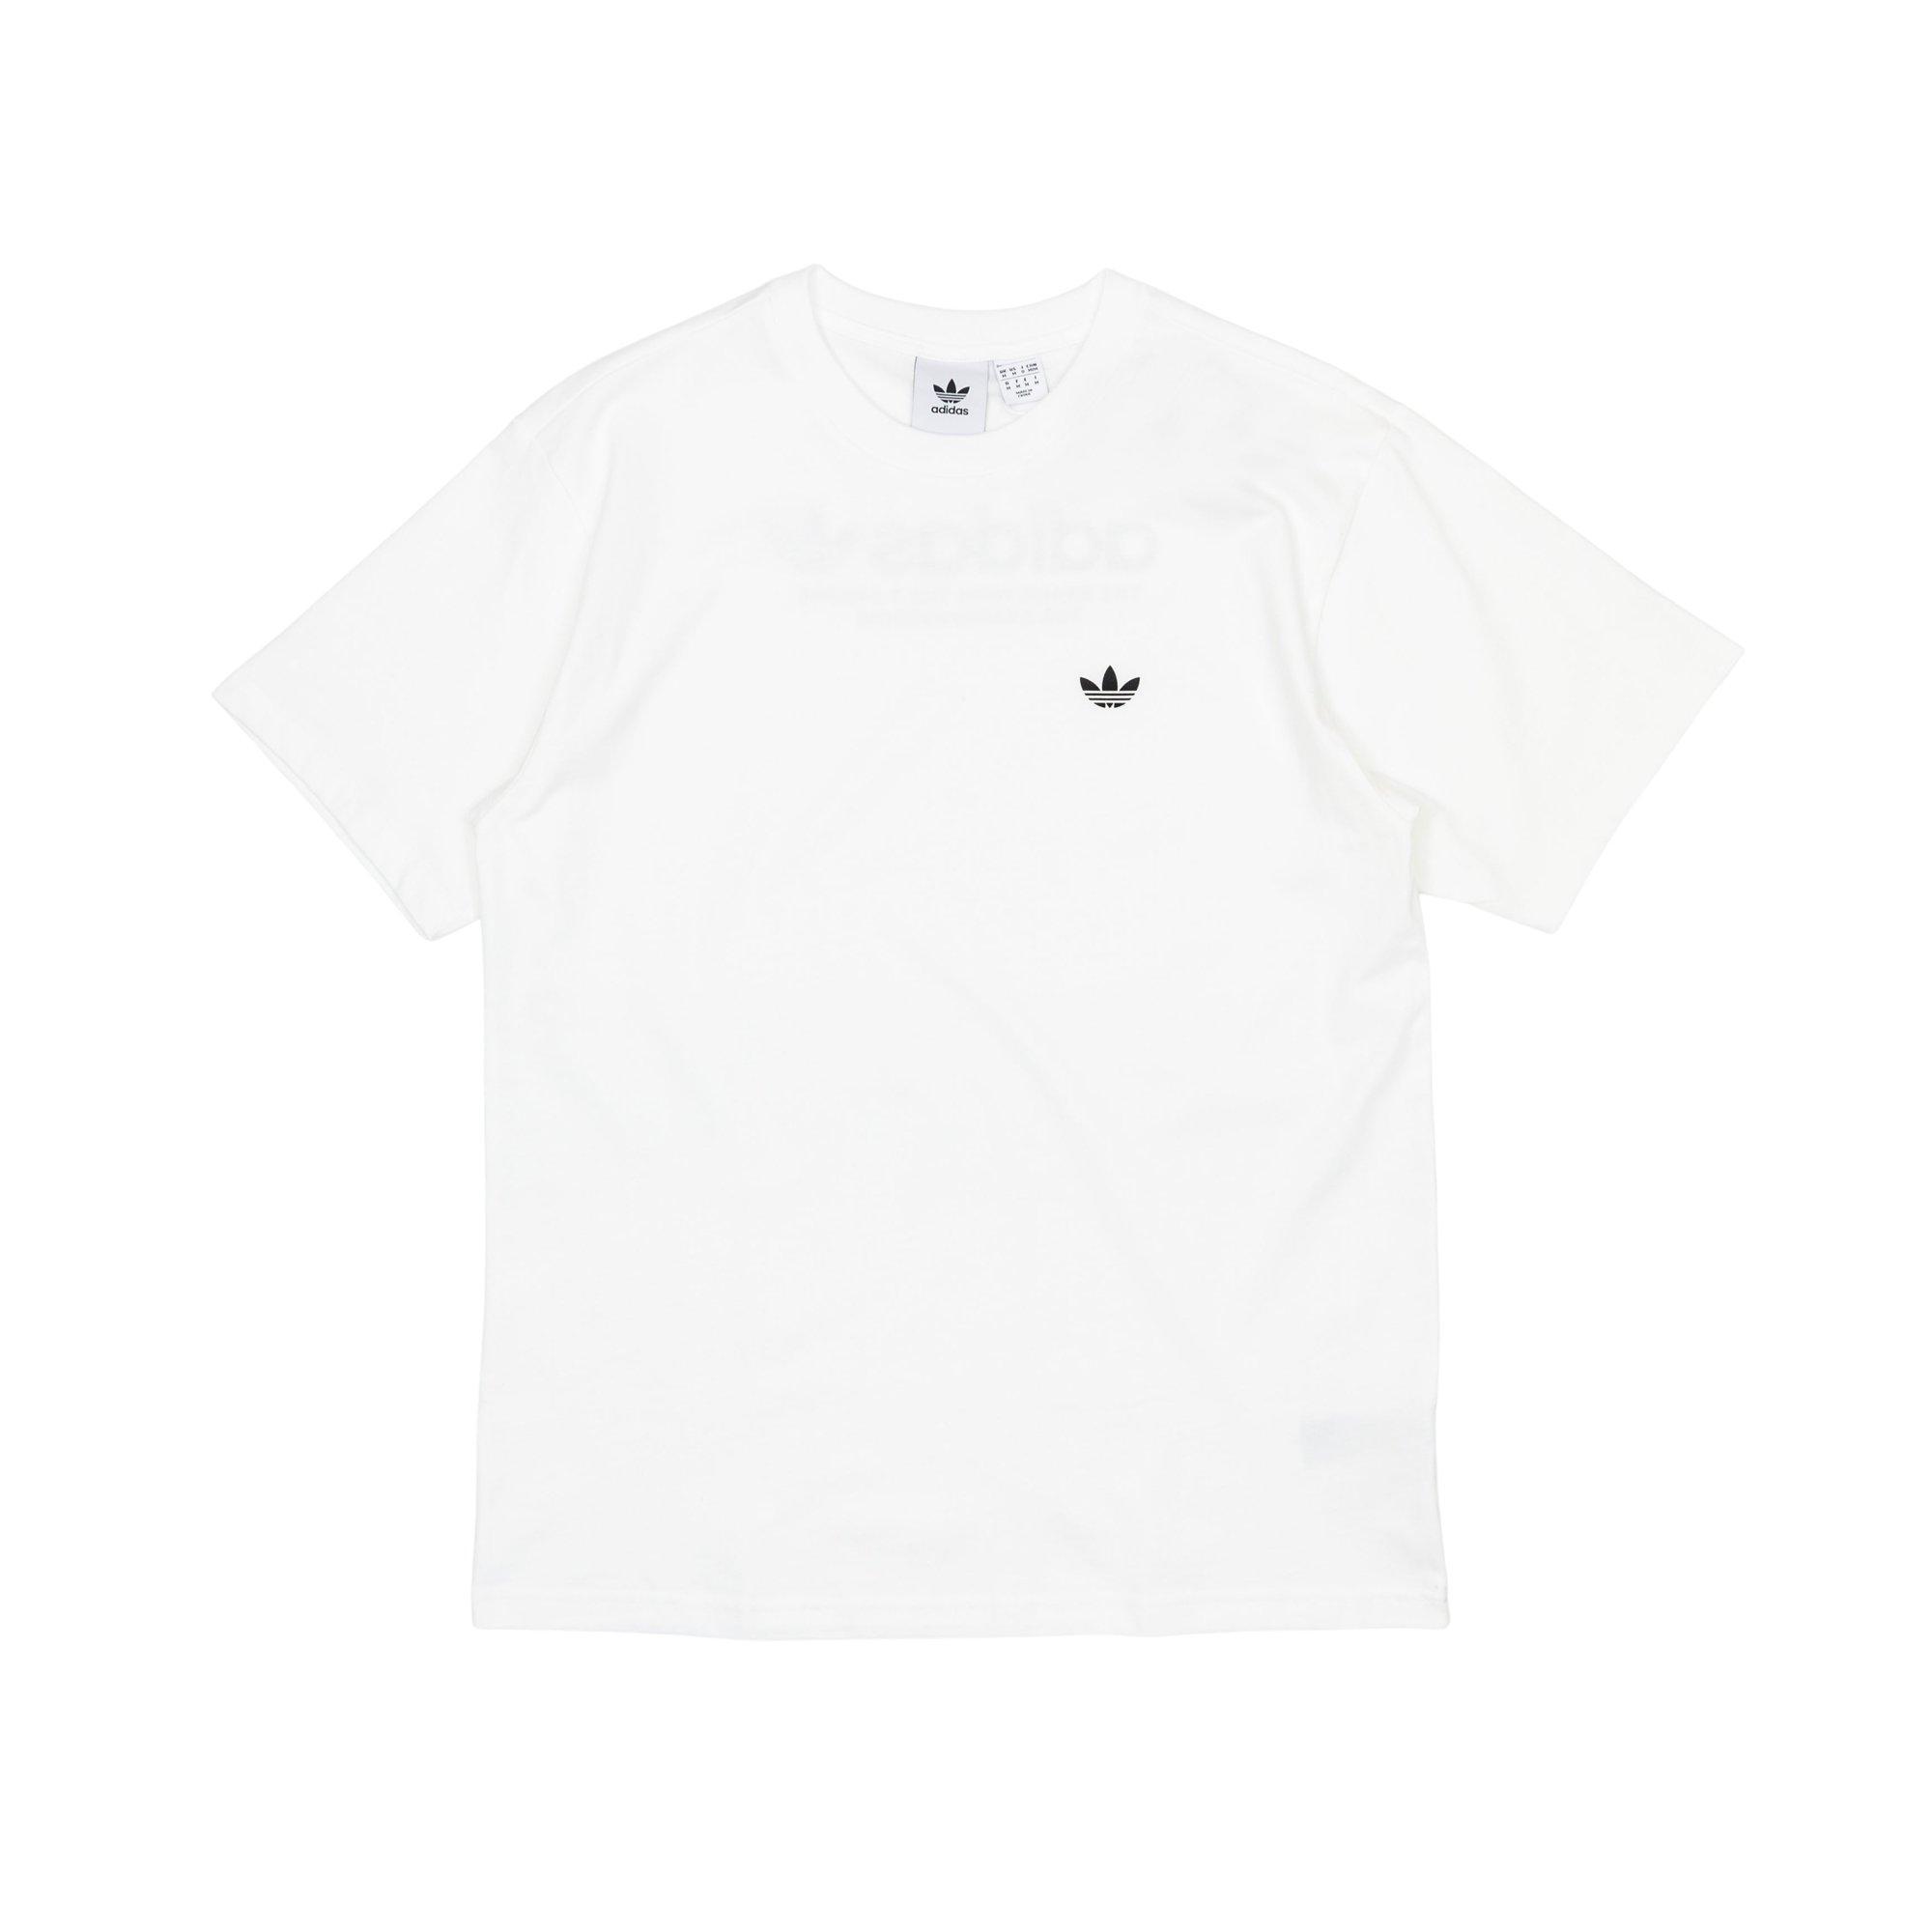 adidas Cotton 4.0 Logo T-shirt in White for Men - Lyst